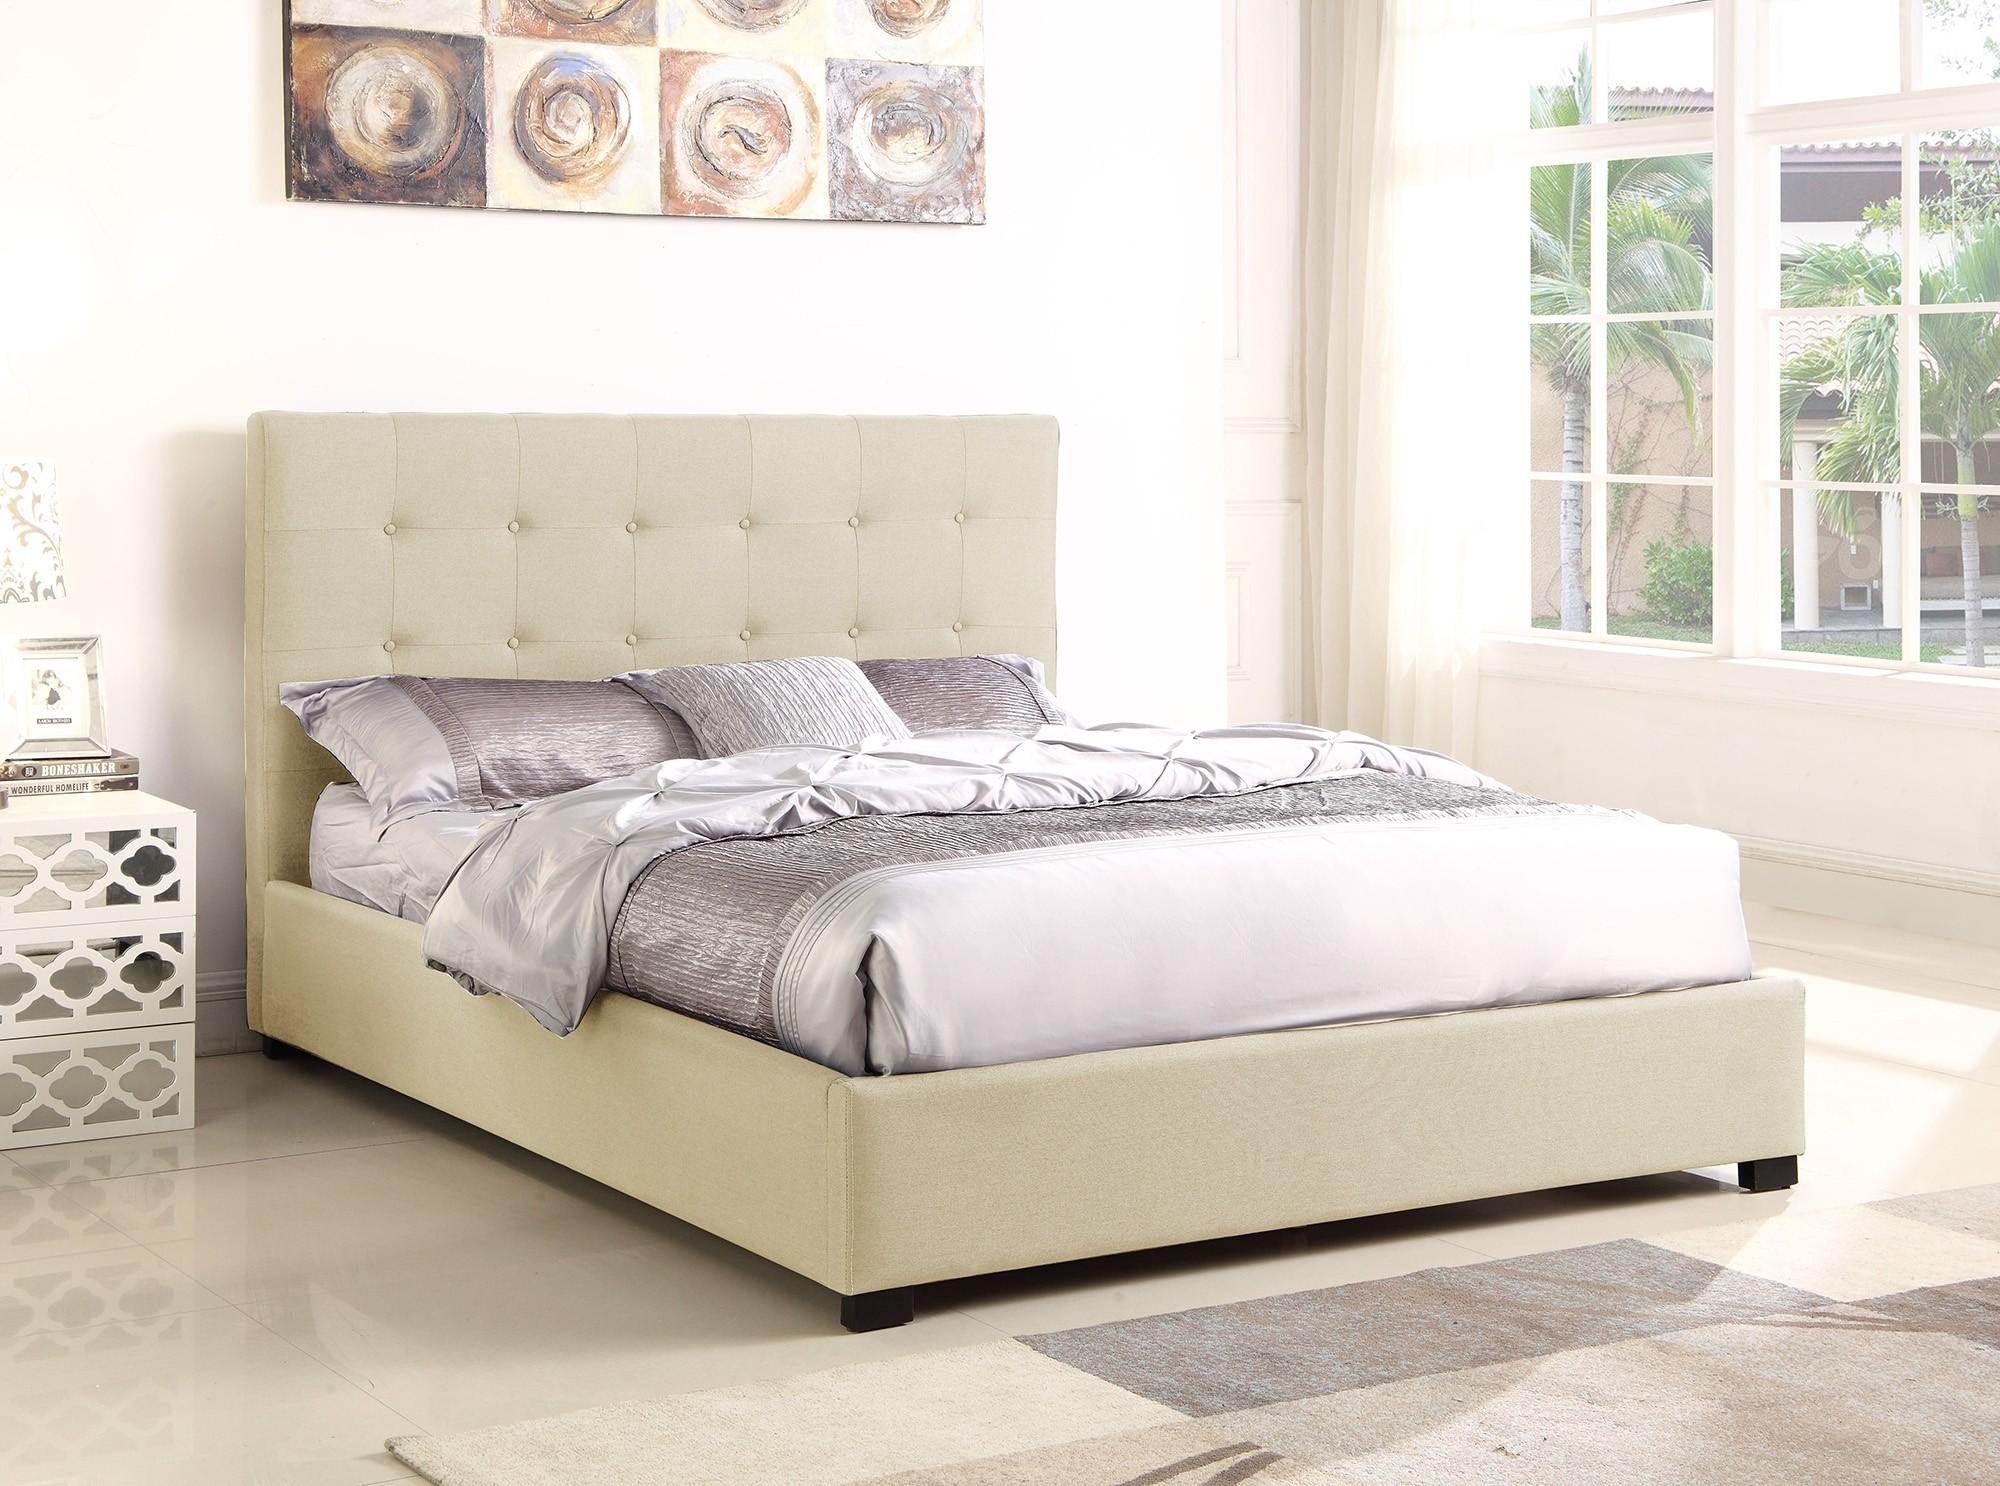 lit coffre layton sommier 140cm tissu beige lits 2 places. Black Bedroom Furniture Sets. Home Design Ideas